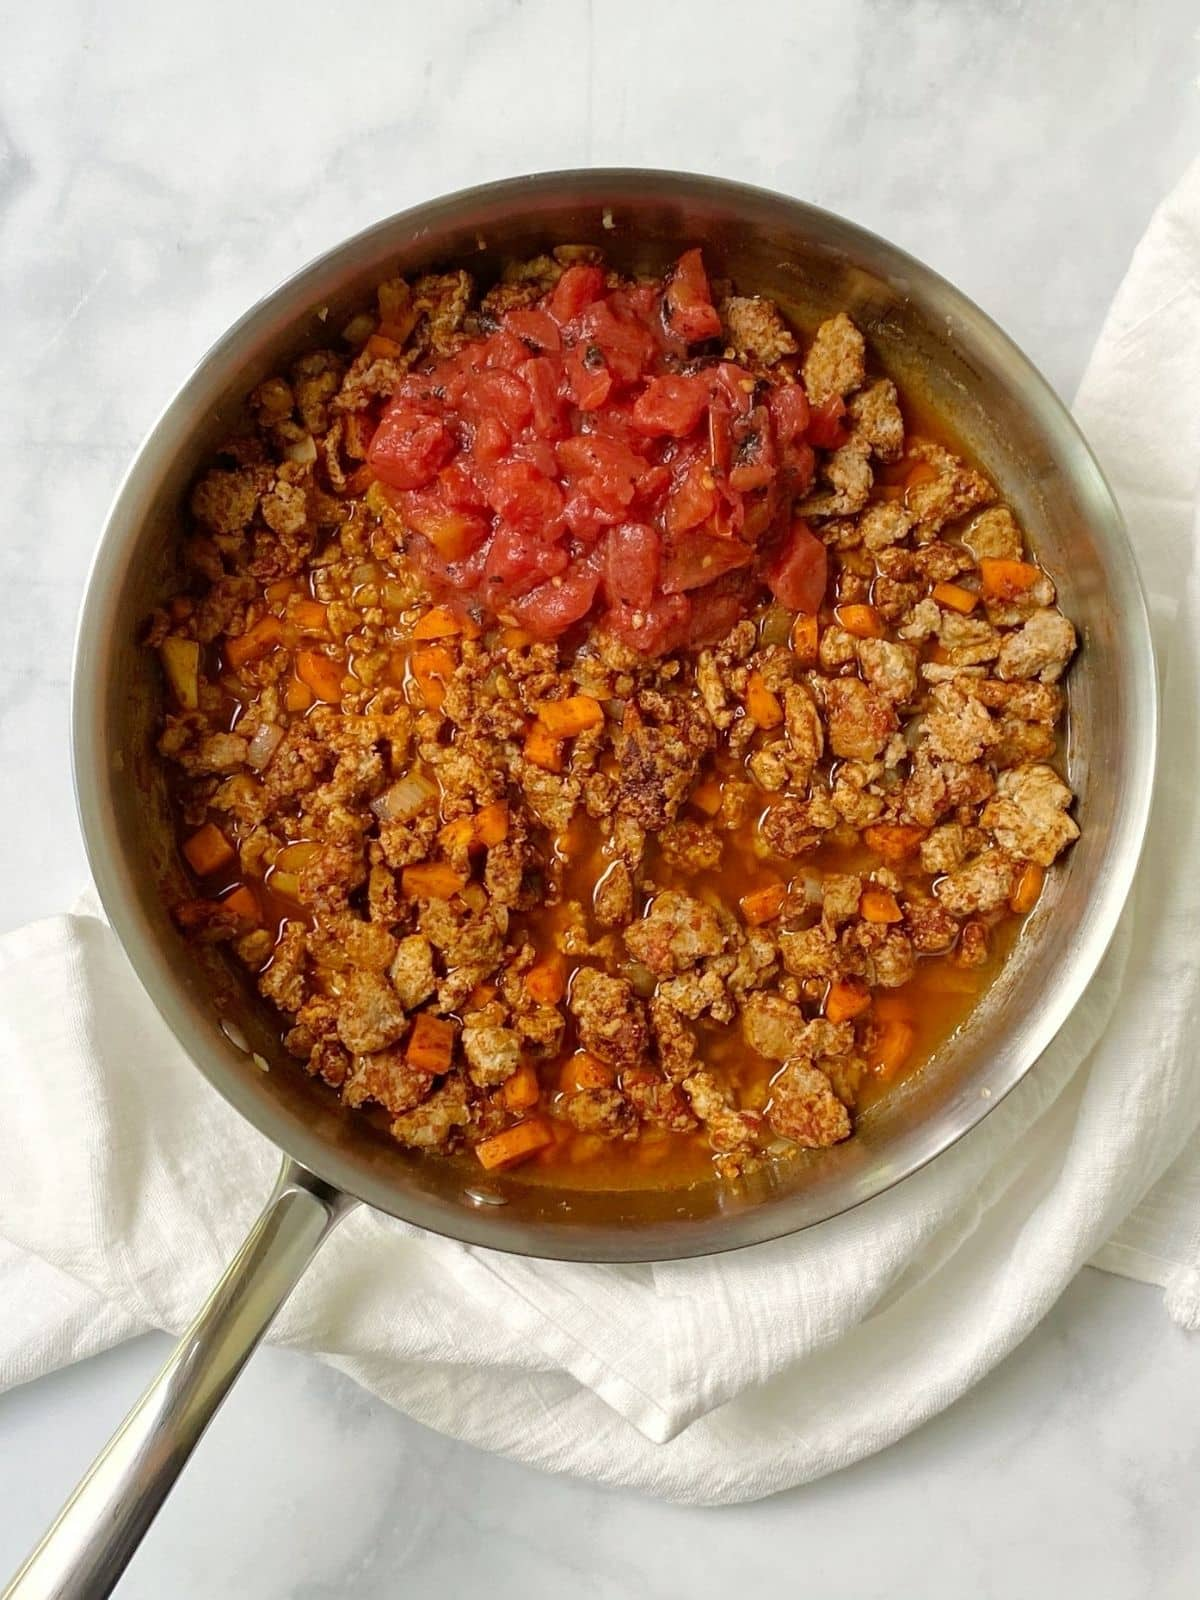 adding tomatoes to turkey chili.